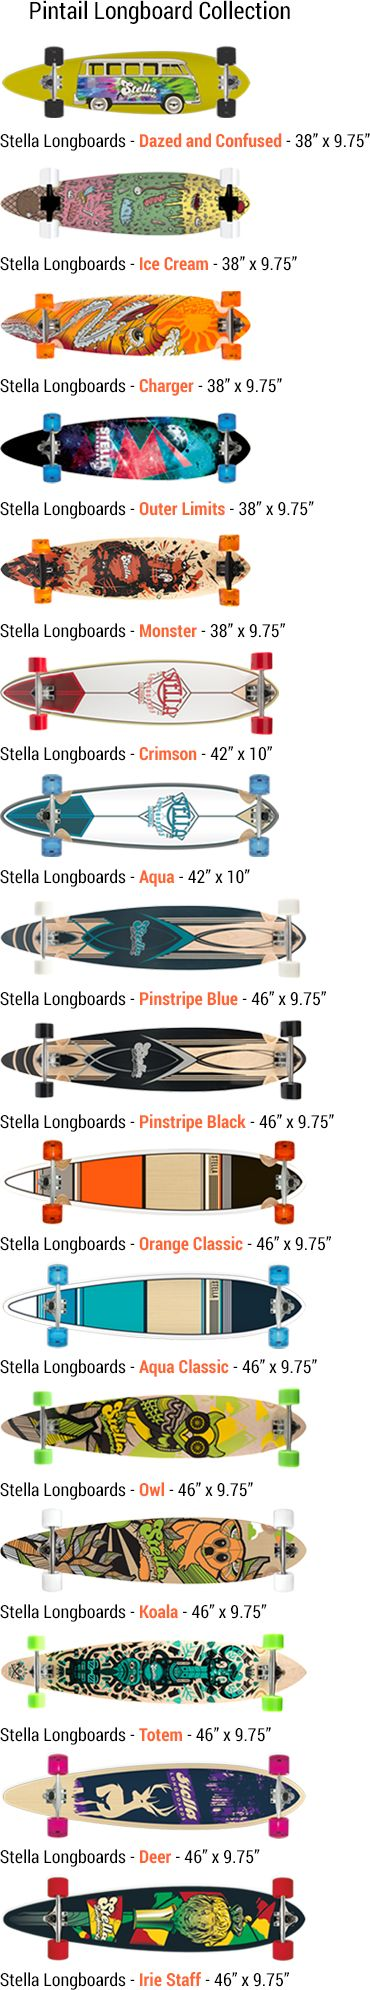 Pintail Longboard Collection from Stella Longboards #longboard @longboardsusa